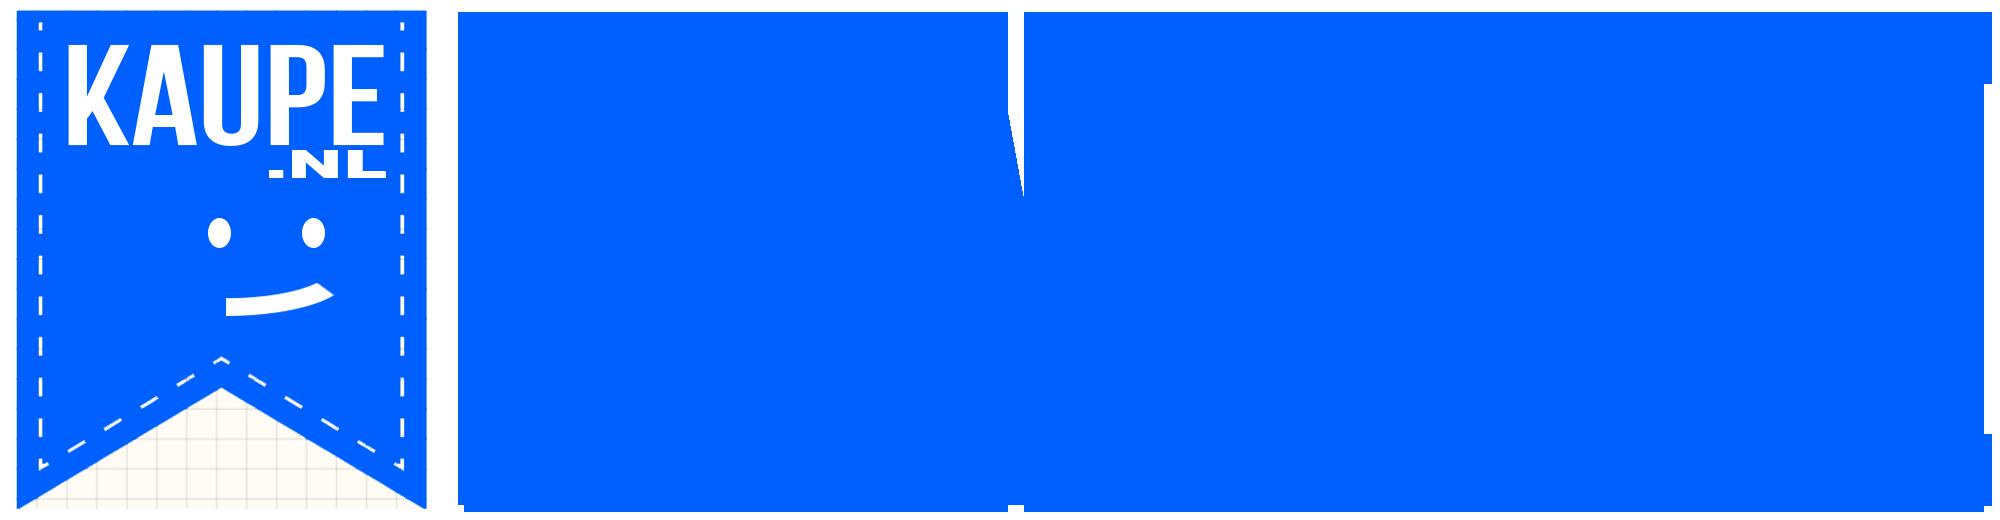 Kaupe.nl / Osimedia